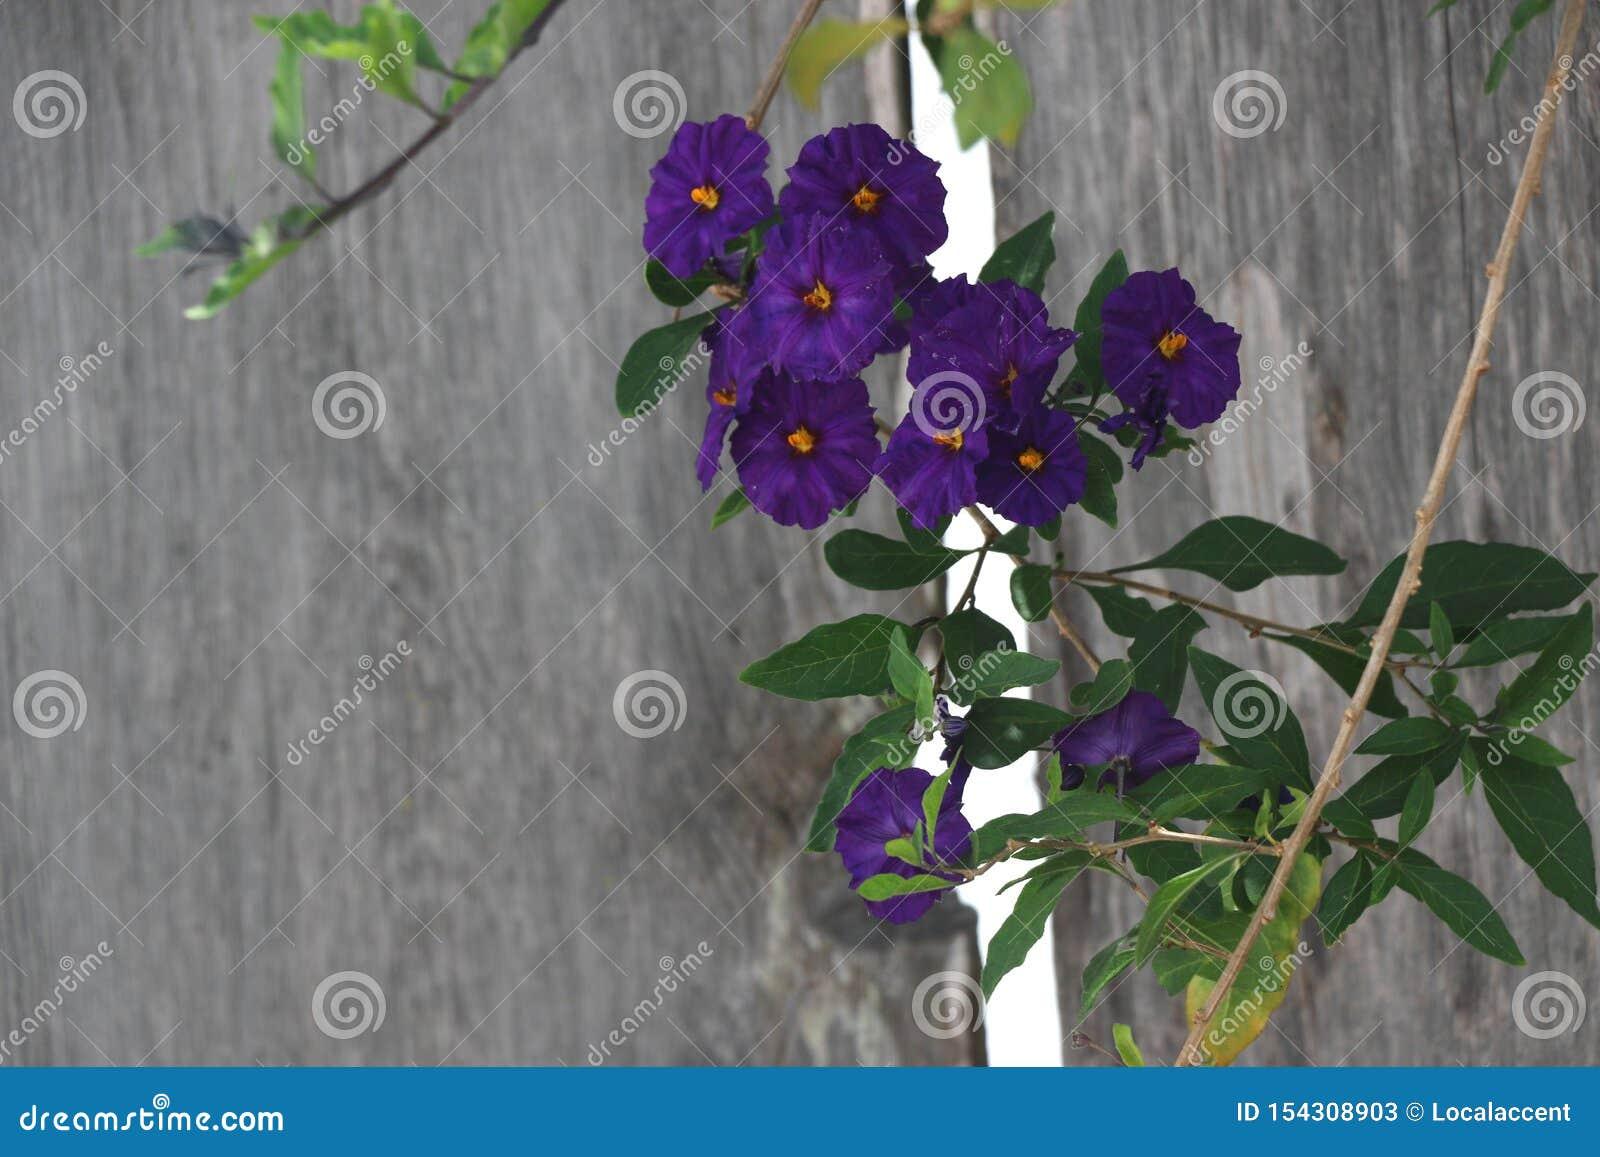 Climbing Vine With Deep Purple Flowers Stock Image Image Of